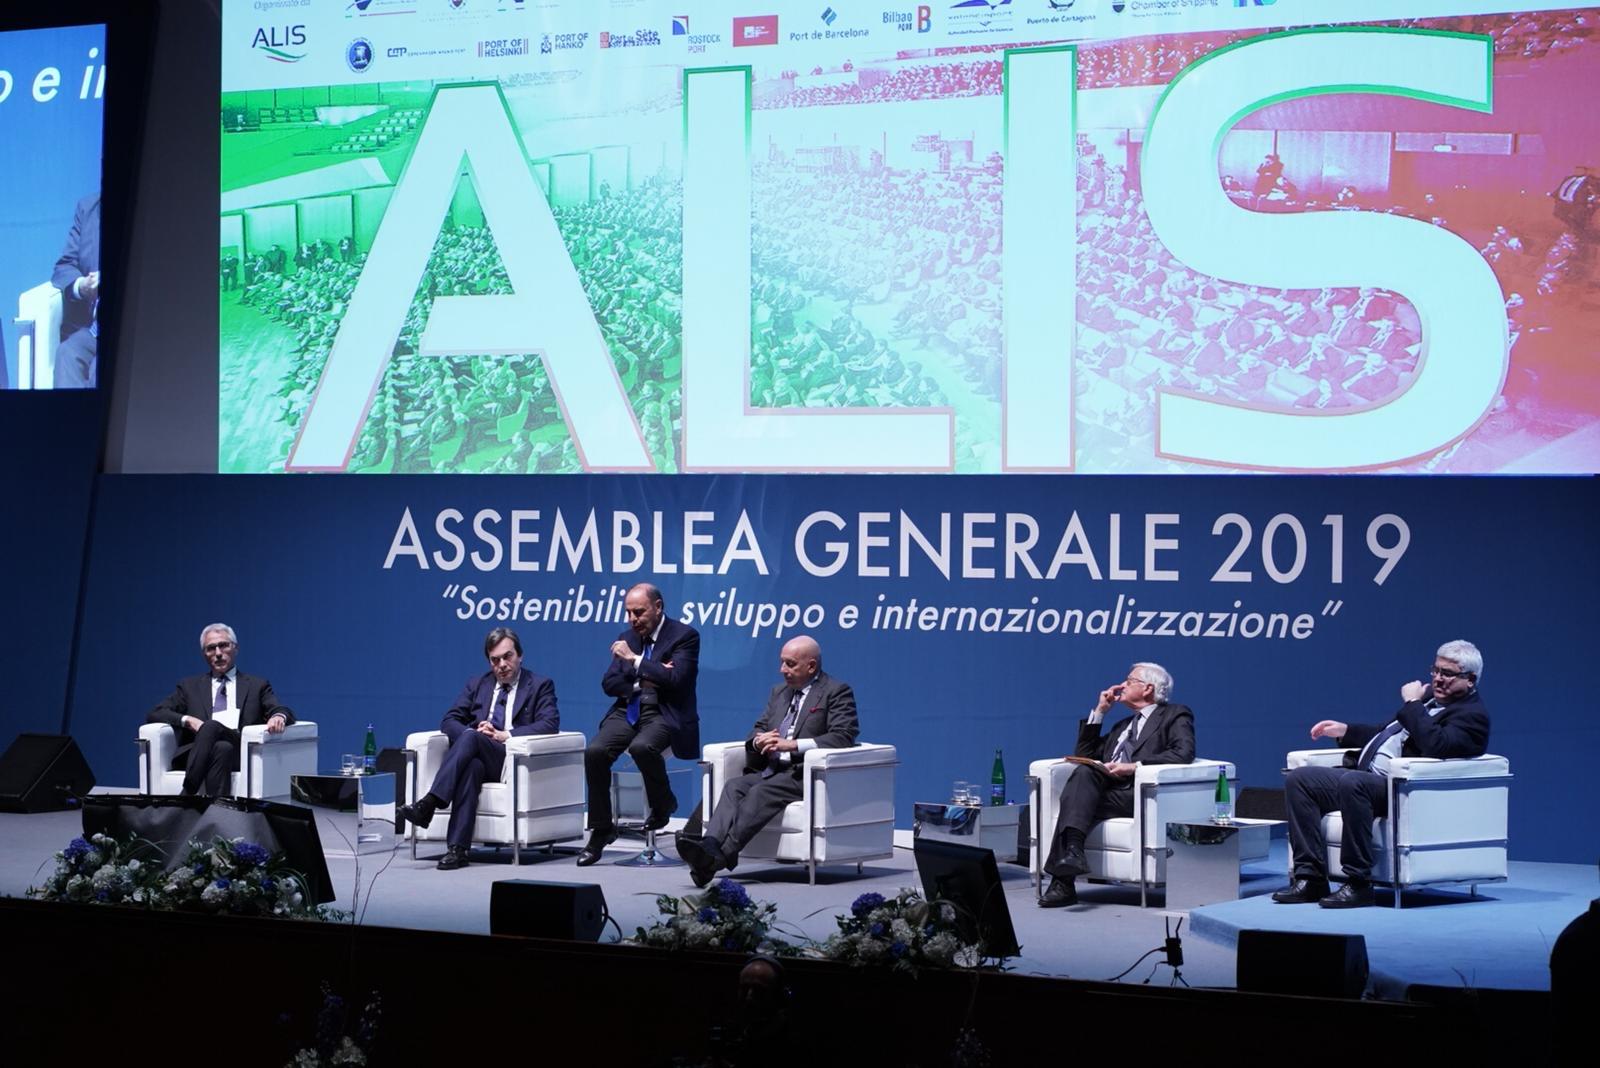 Rassegna Stampa III Assemblea Generale ALIS 2019